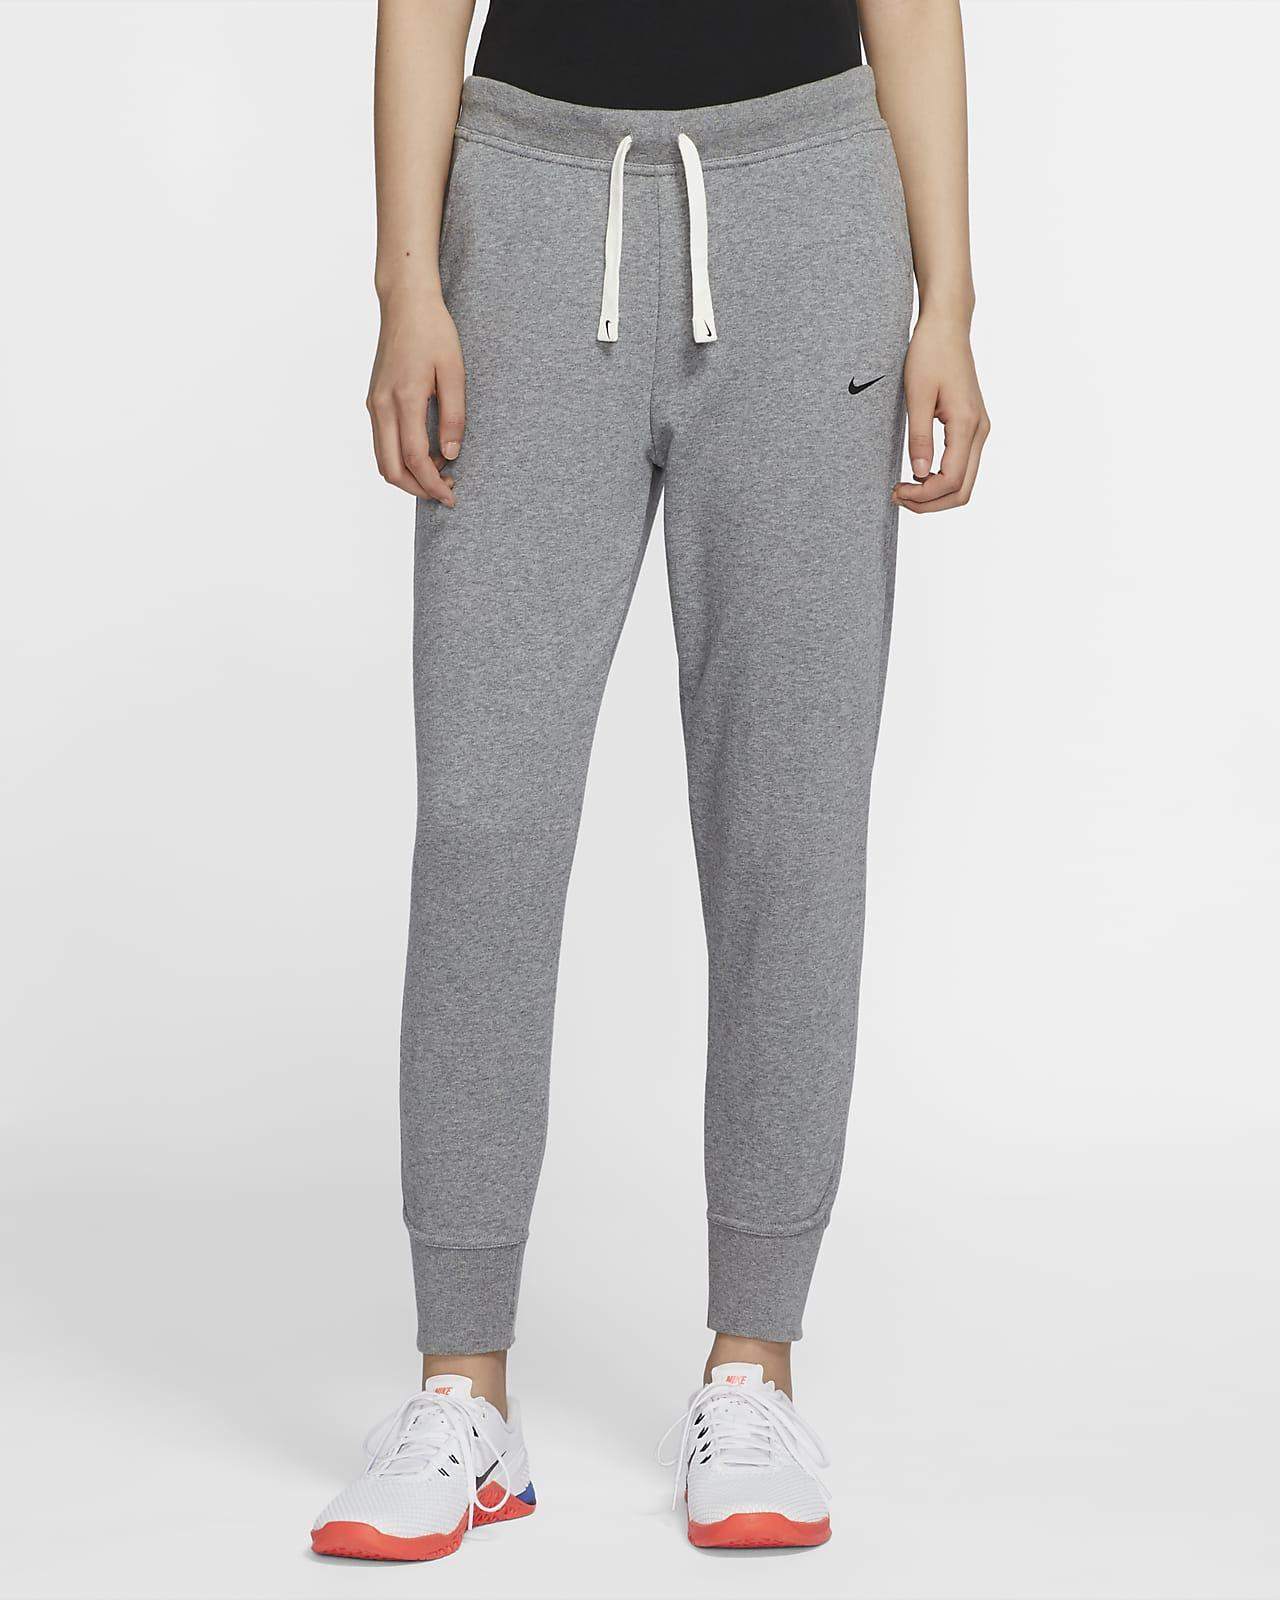 Nike Dri-FIT Get Fit Women's Training Trousers